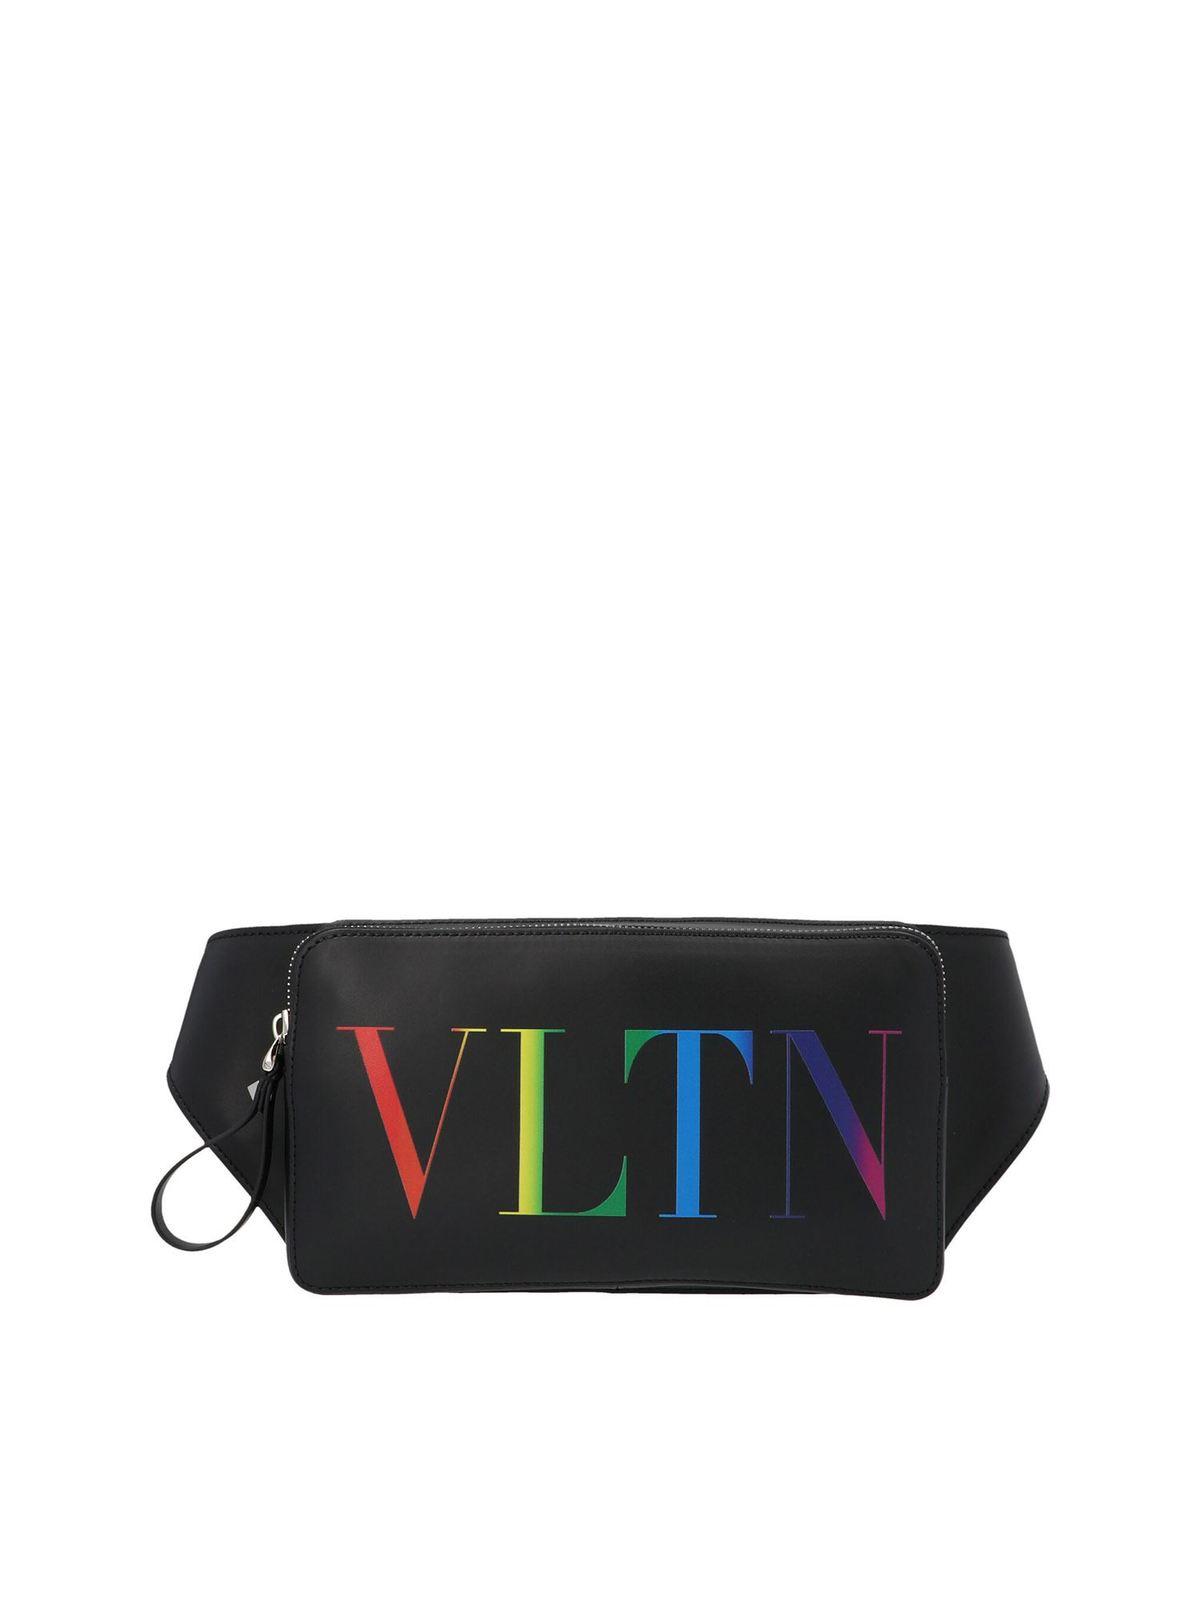 Valentino VLTN PRINT BELT BAG IN BLACK